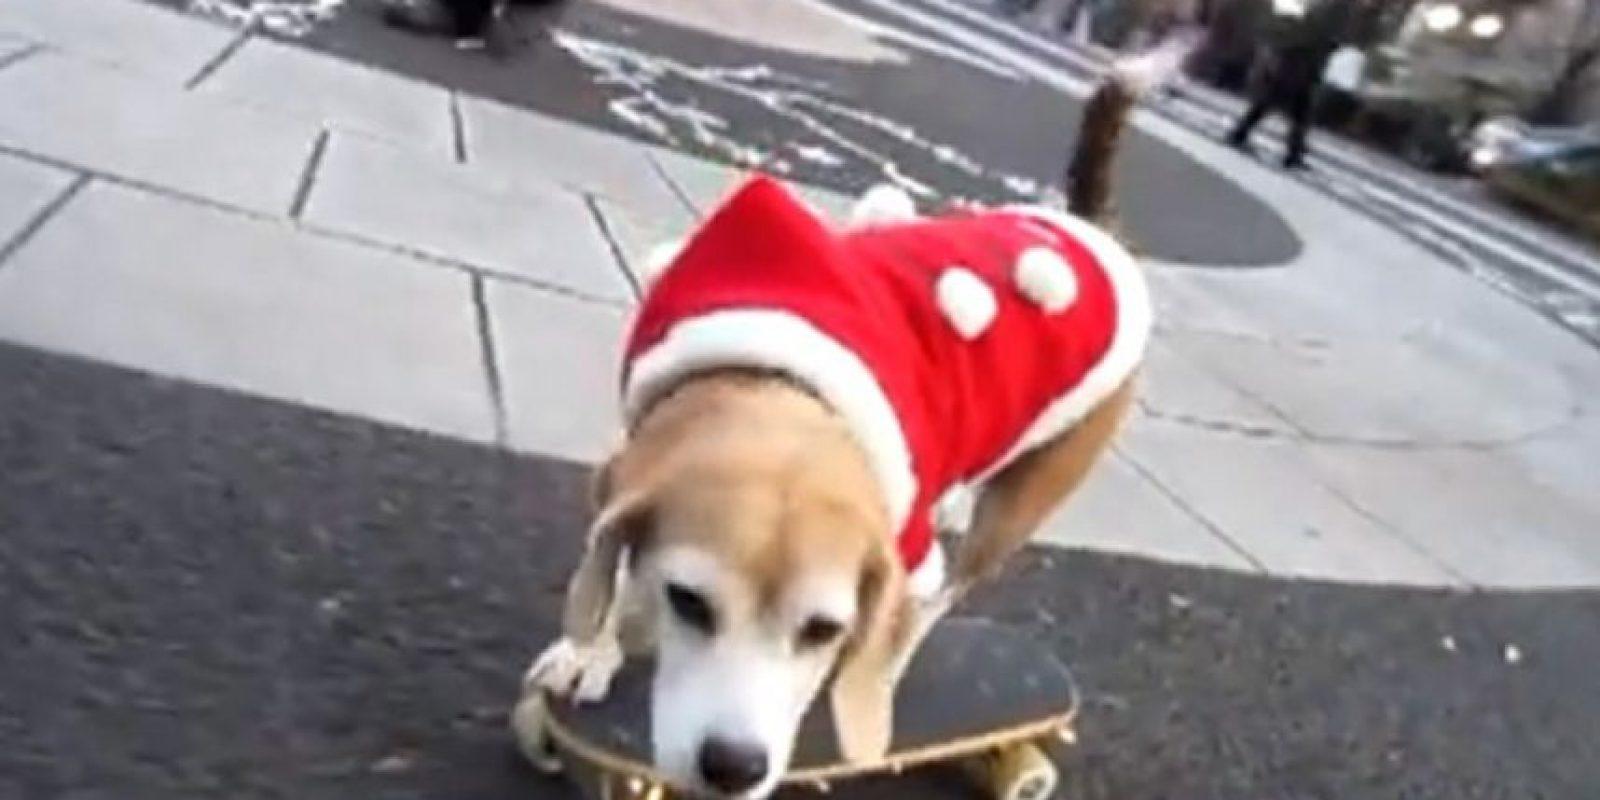 De Santa y en patineta ¡Cool! Foto:Tumblr.com/Tagged/masctoas-santa-claus